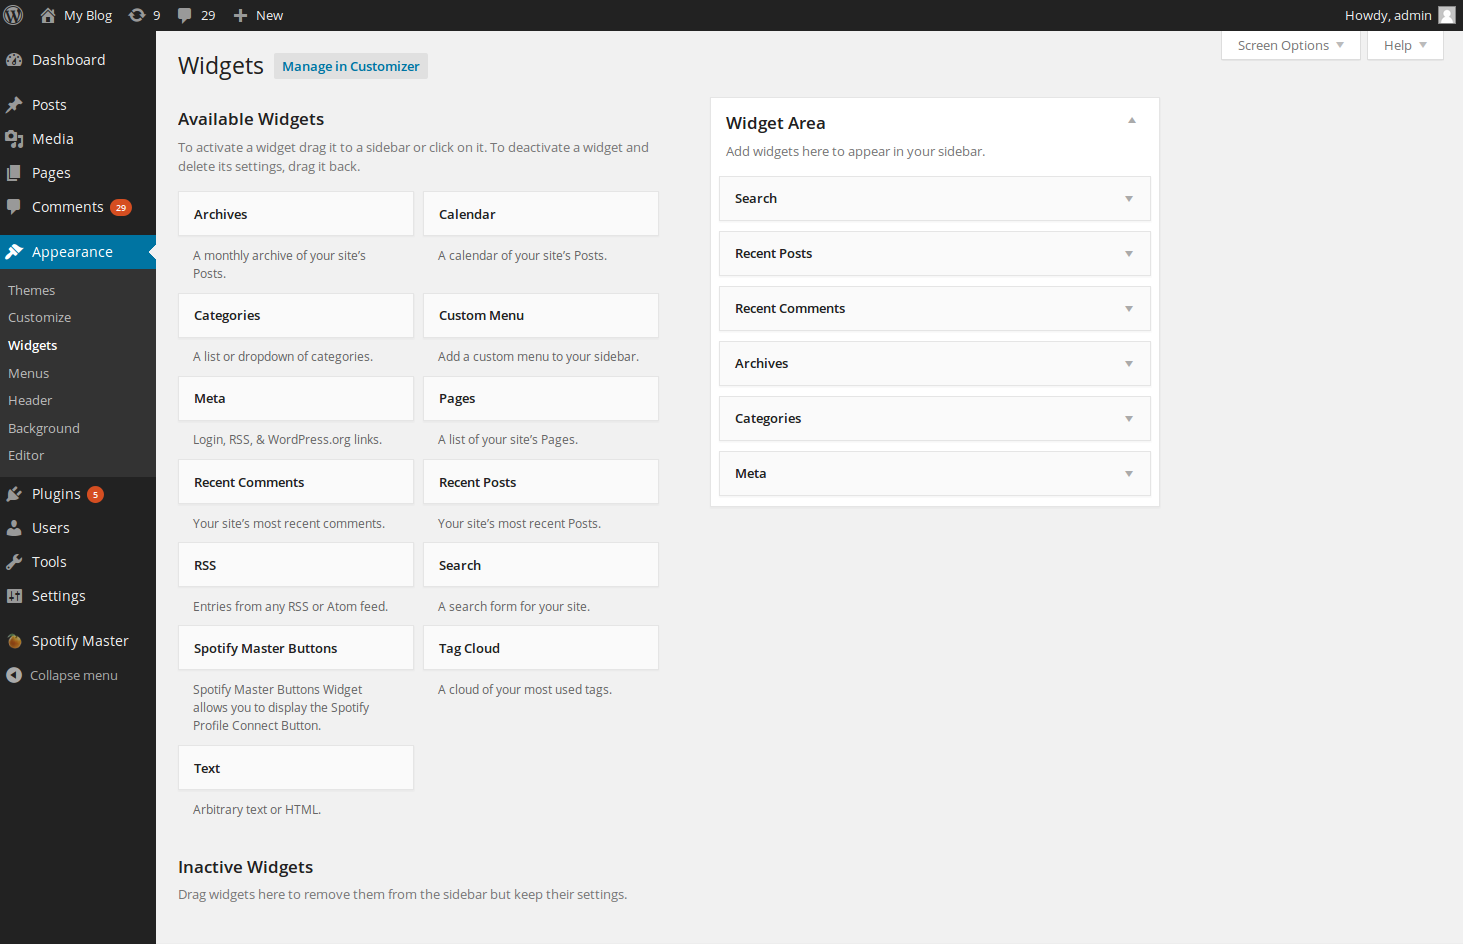 wordpress plugins spotify master 5